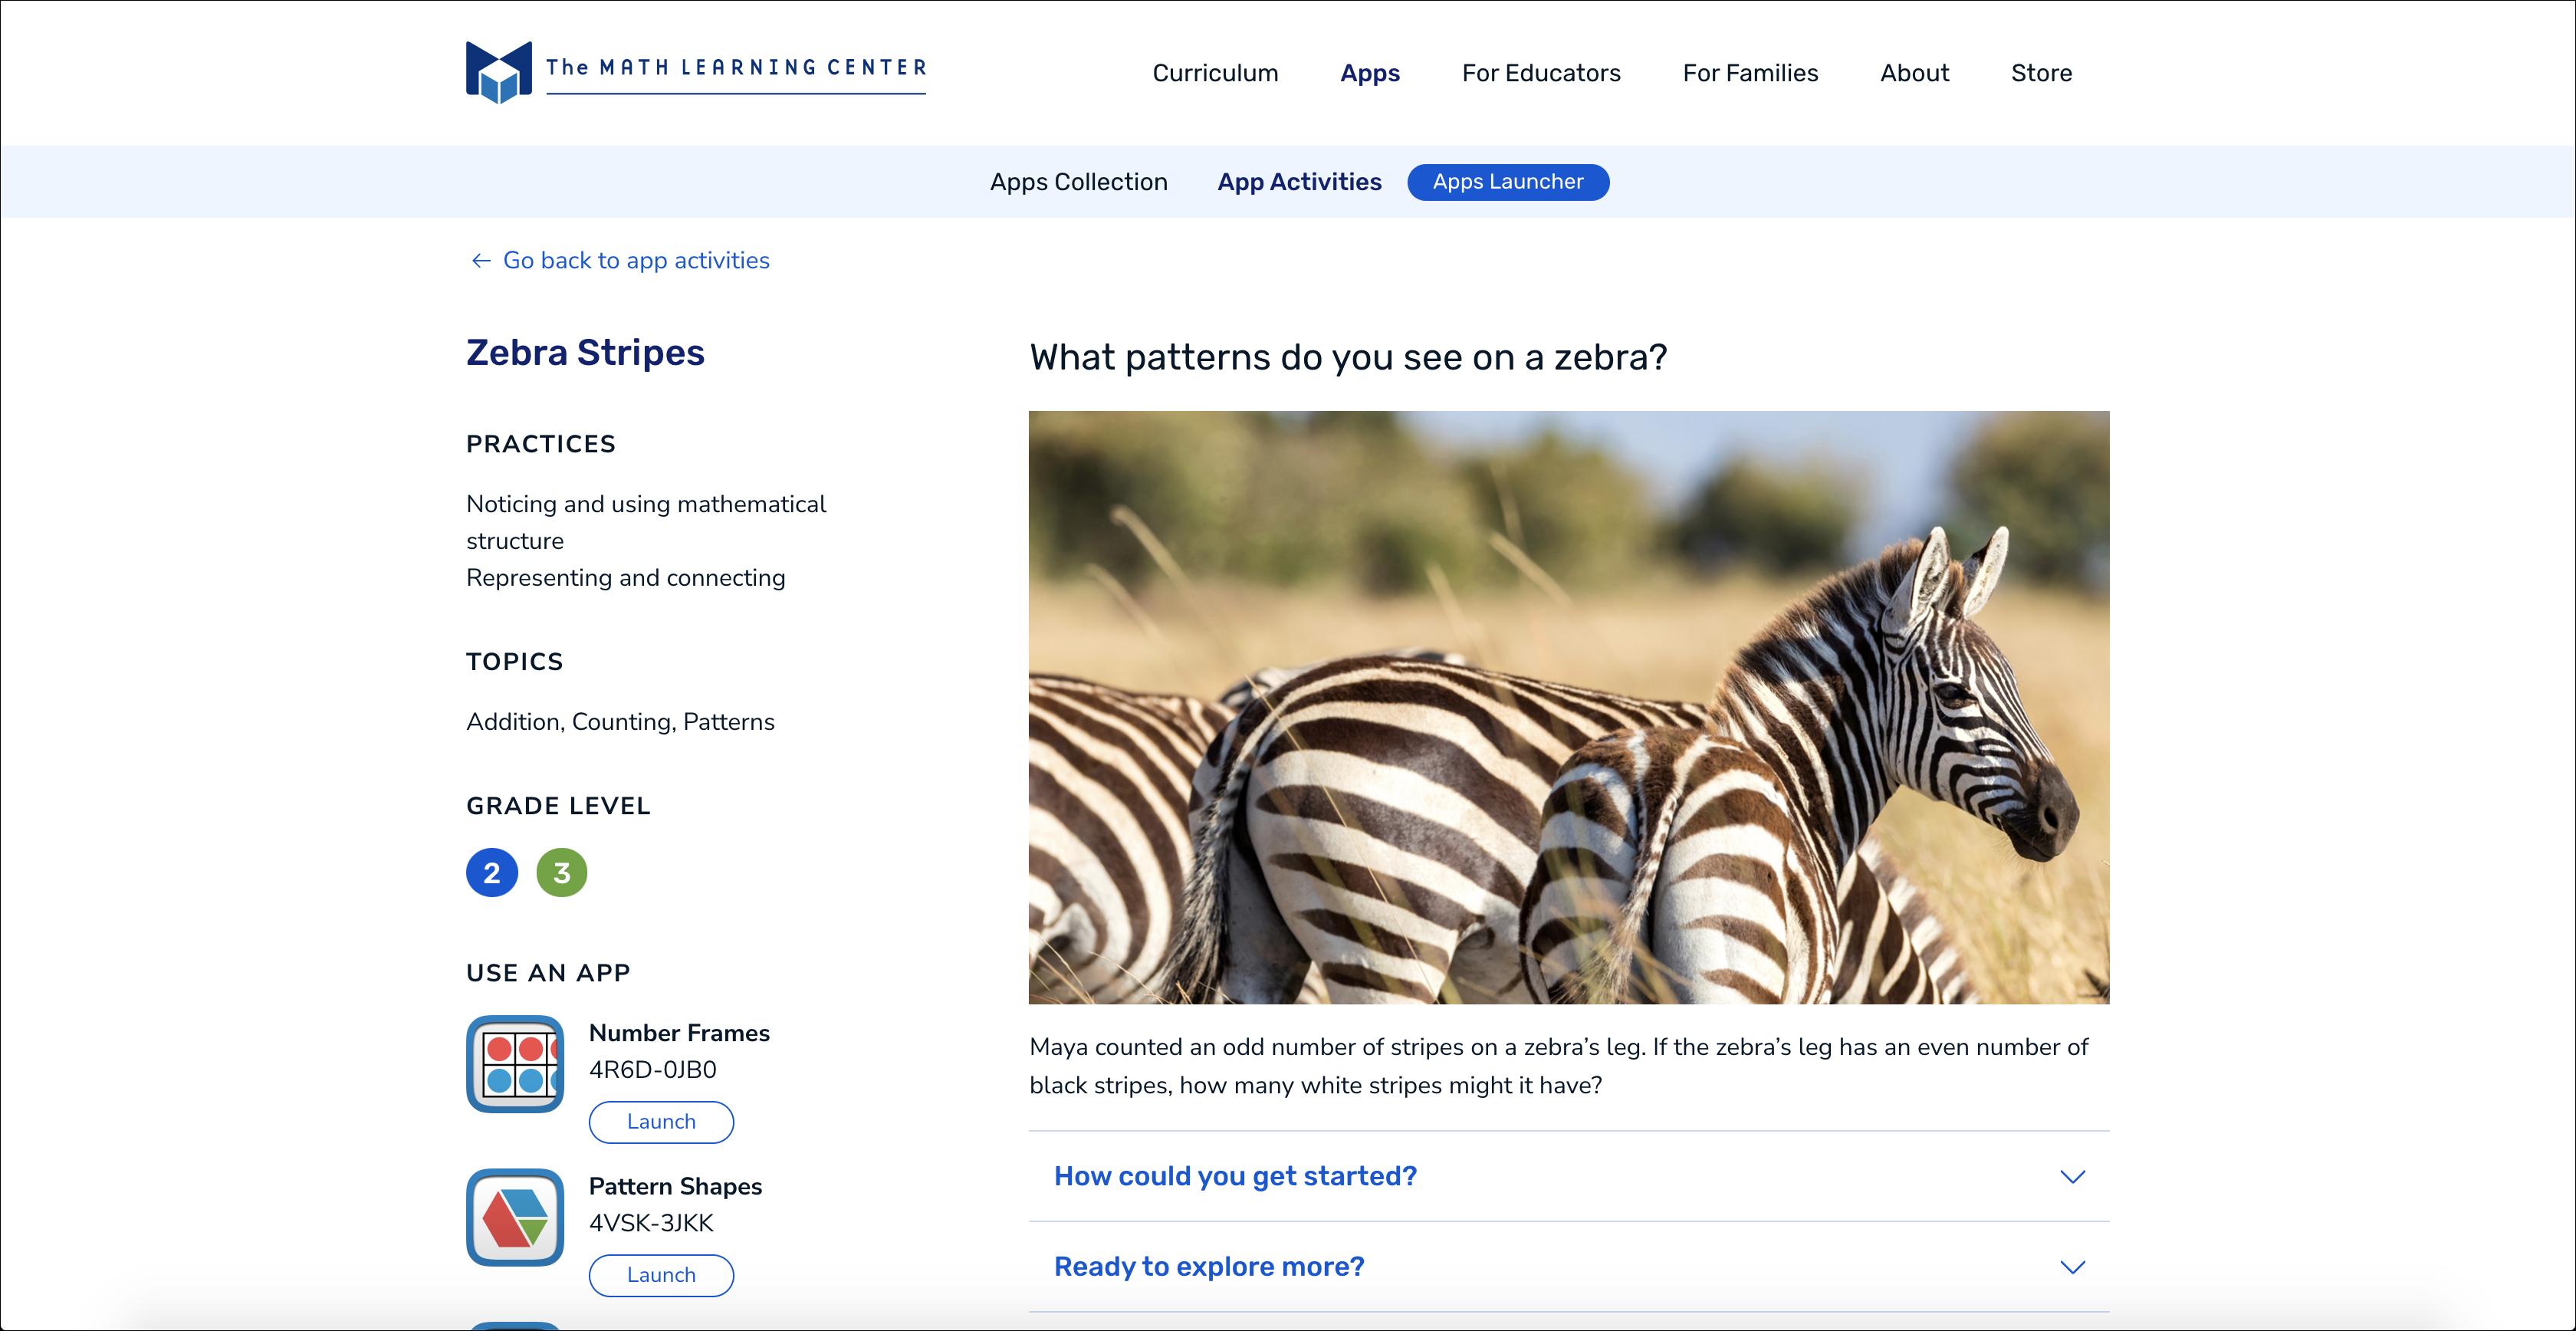 Zebra Stripes App Activity